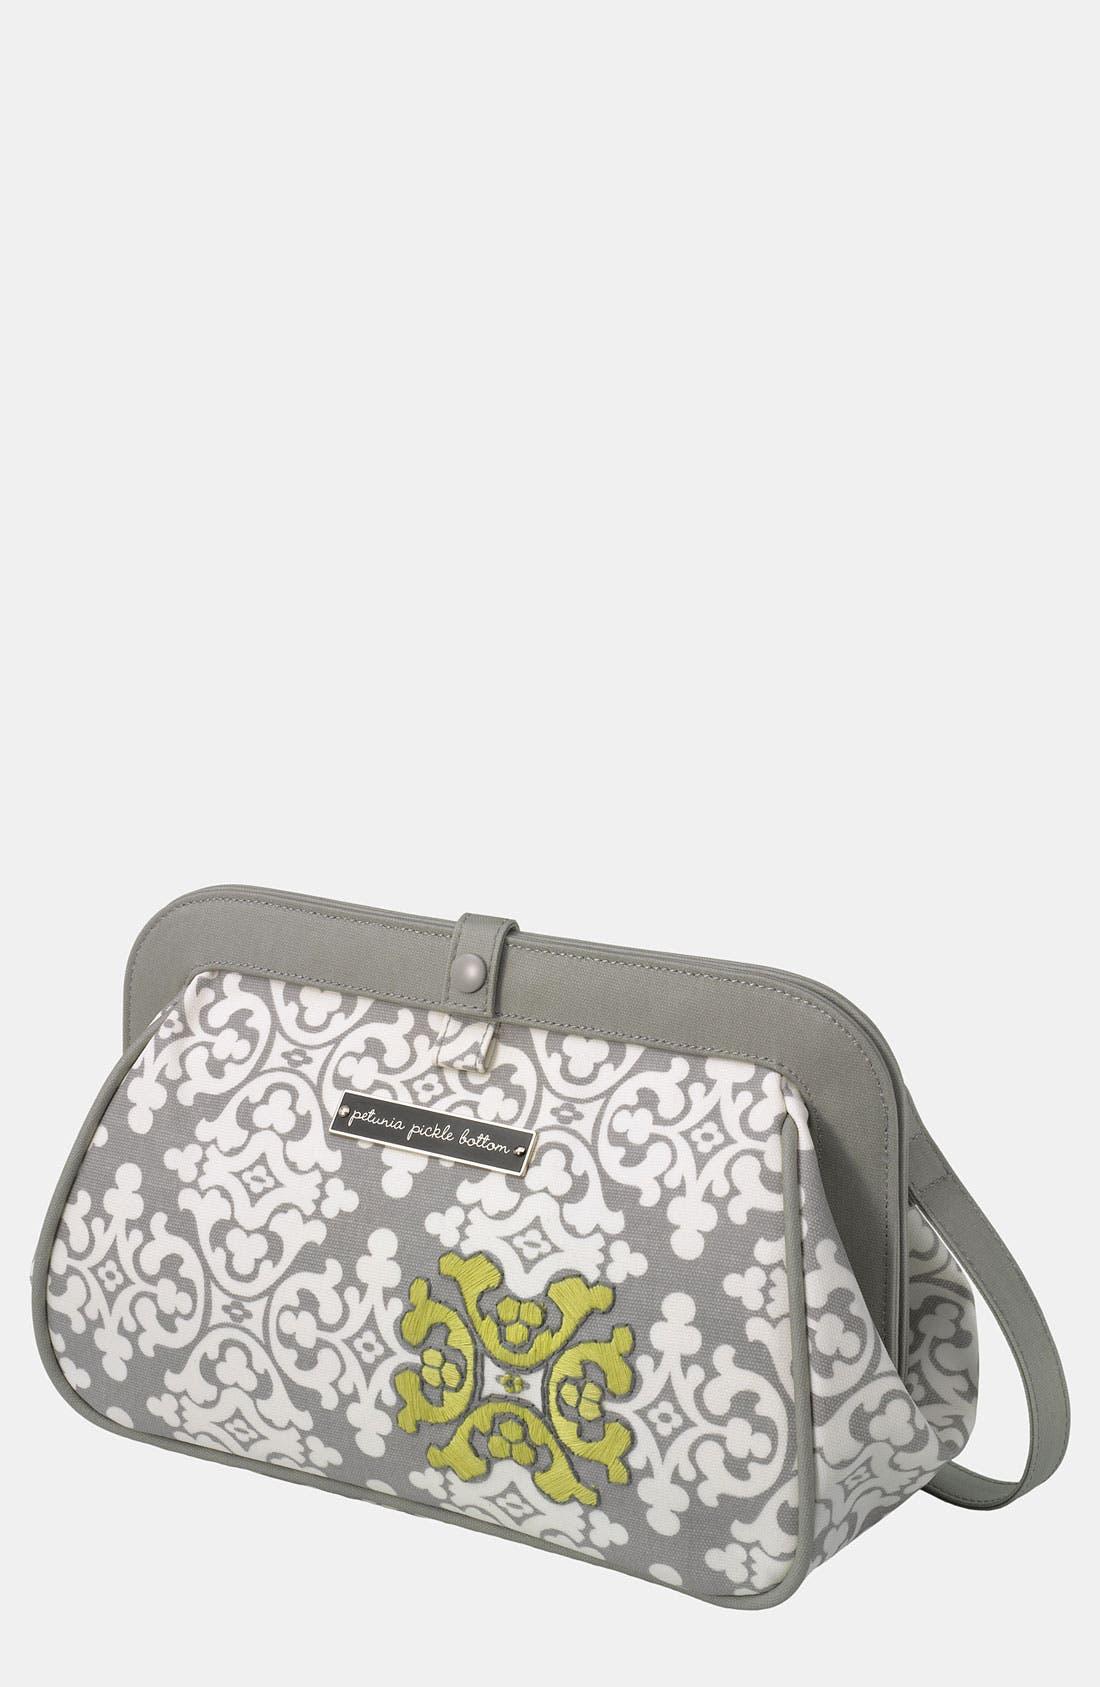 Main Image - Petunia Pickle Bottom 'Crosstown' Glazed Clutch Diaper Bag